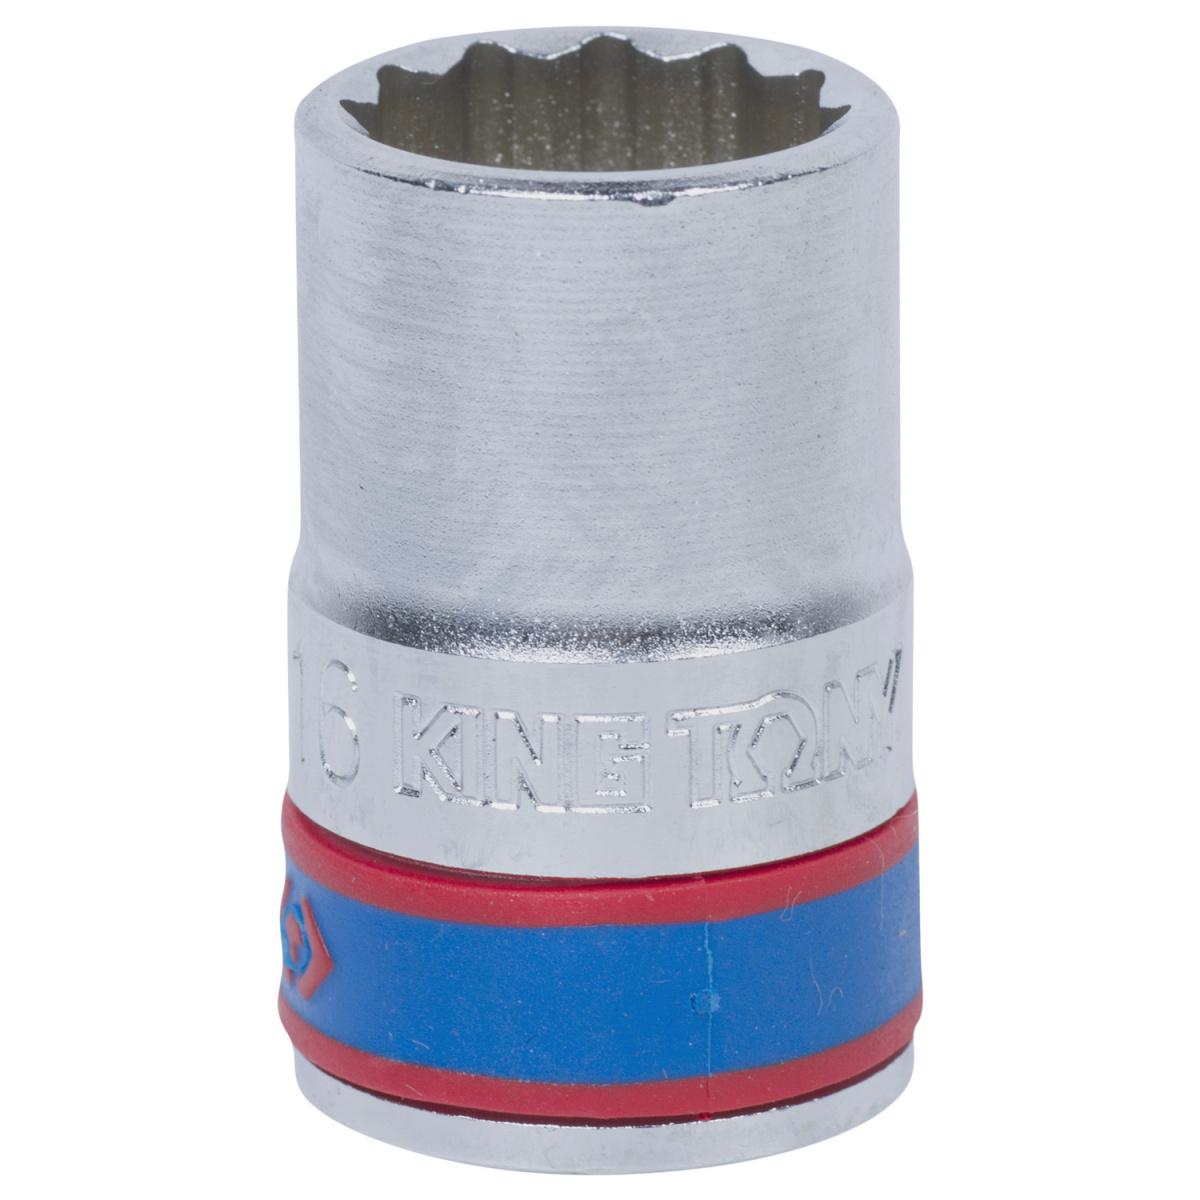 "Головка торцевая стандартная двенадцатигранная 1/2"", 16 мм KING TONY 433016M"